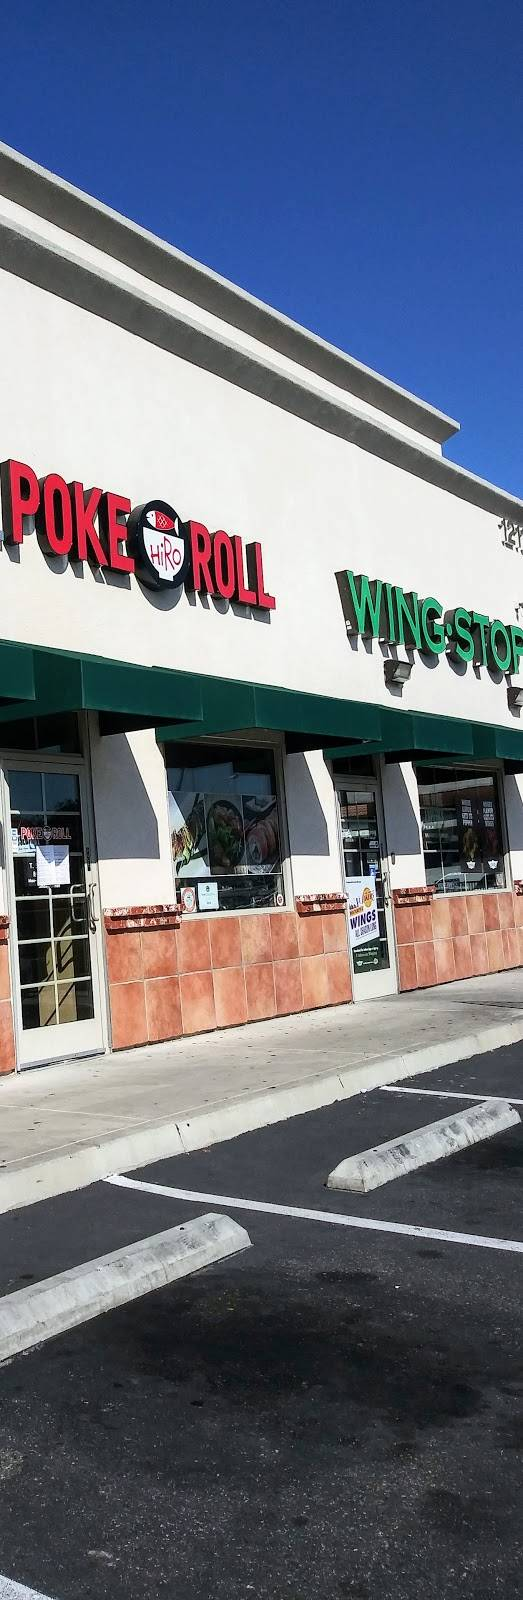 Hiro Poke & Roll   restaurant   1211 E La Habra Blvd, La Habra, CA 90631, USA   5626905544 OR +1 562-690-5544